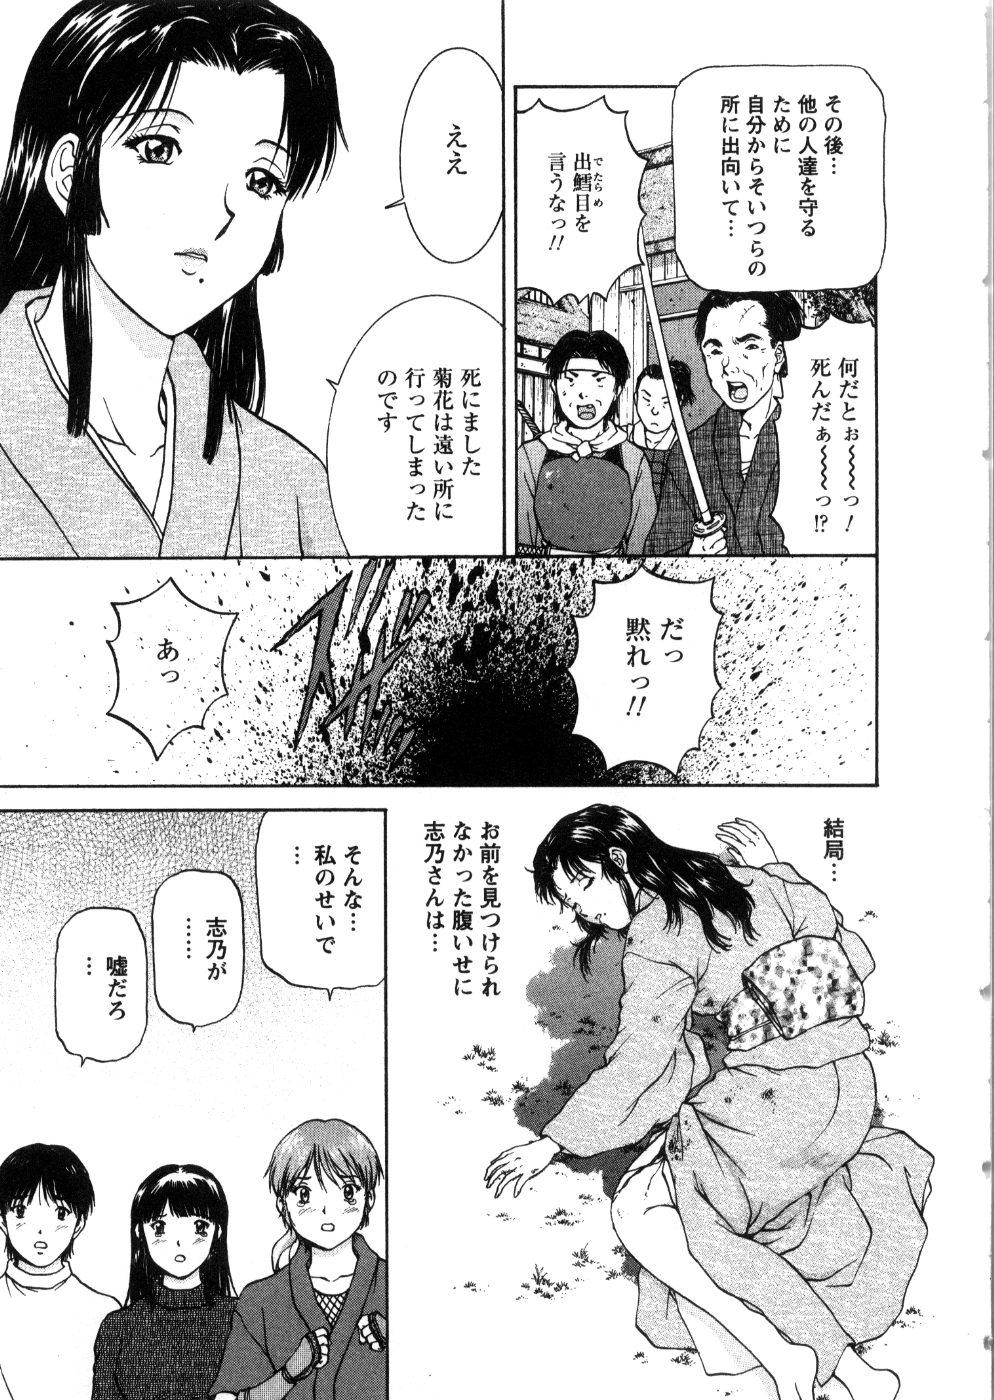 Oneechan-tachi ga Yatte Kuru 03 16